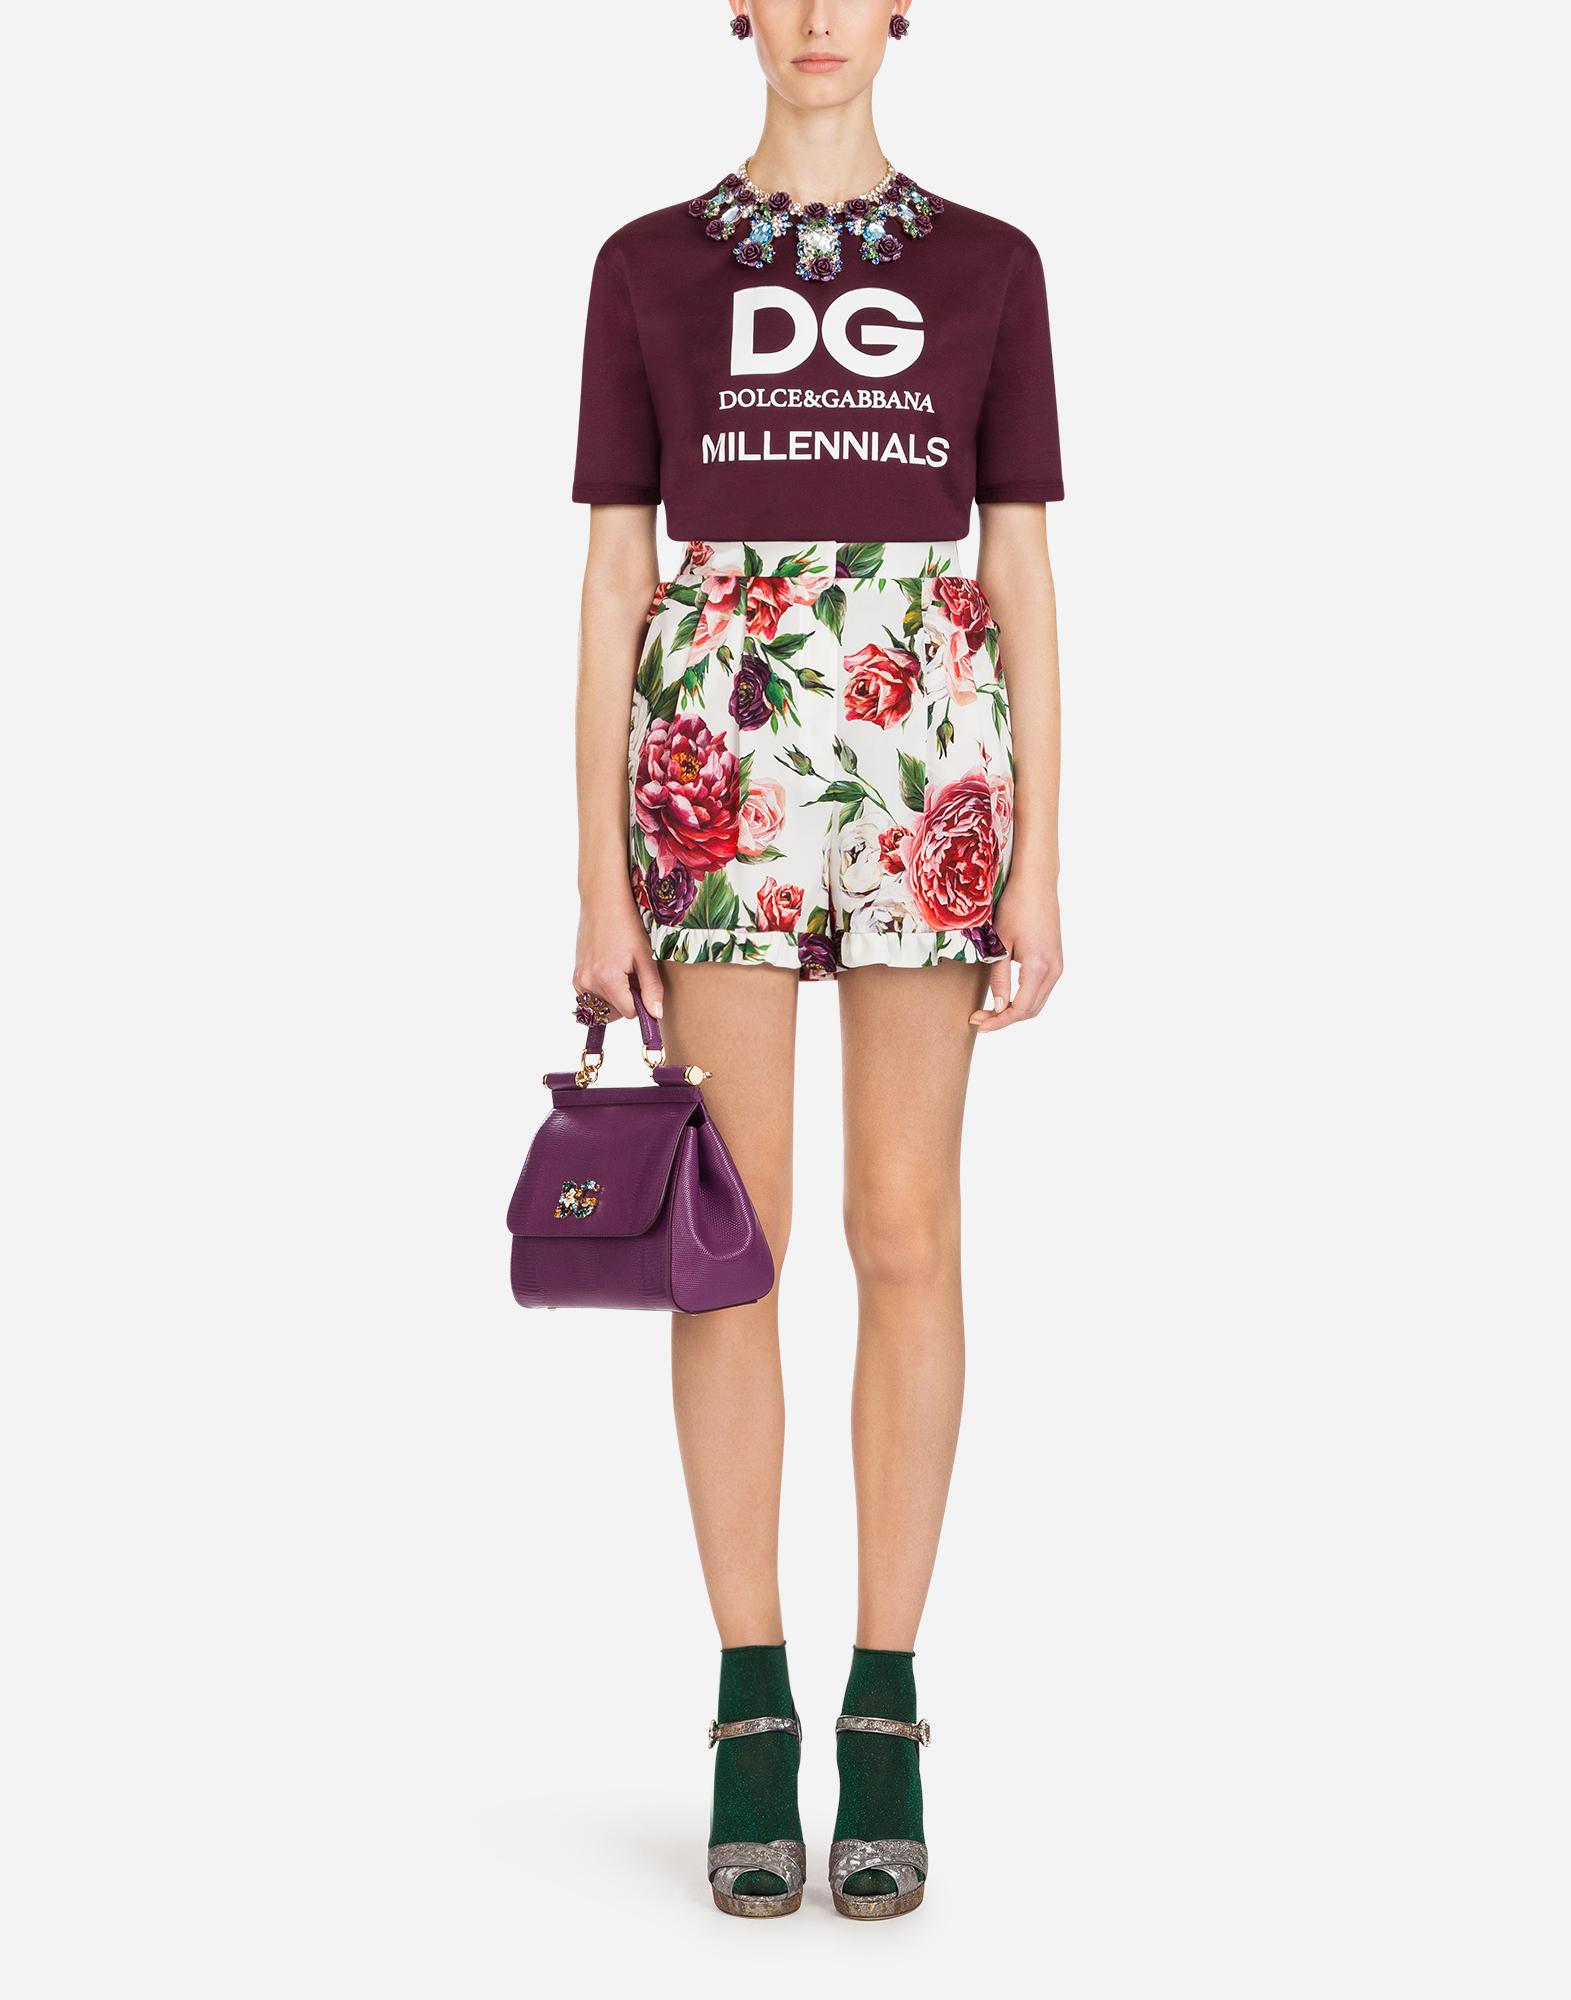 Dolce&Gabbana MEDIUM CALFSKIN SICILY BAG WITH IGUANA PRINT AND DG CRYSTAL LOGO PATCH